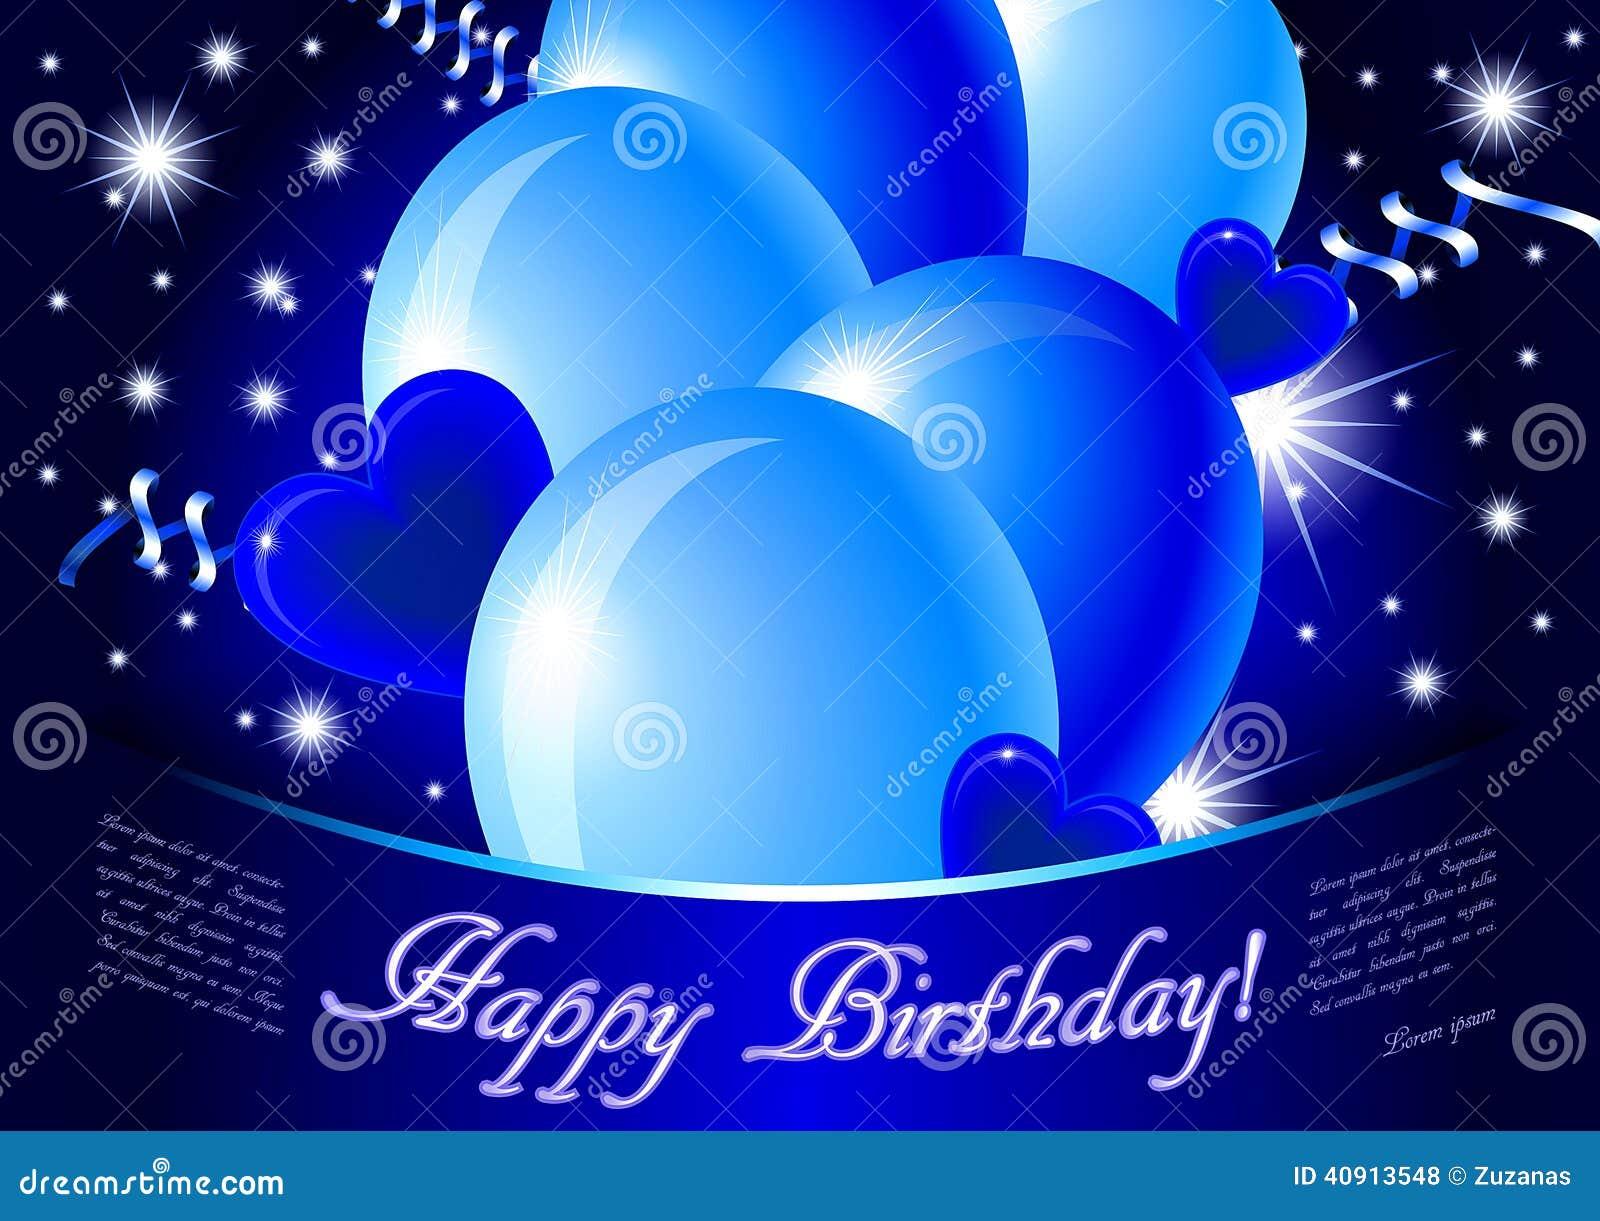 Blue Happy Birthday Card Stock Illustration Image 40913548